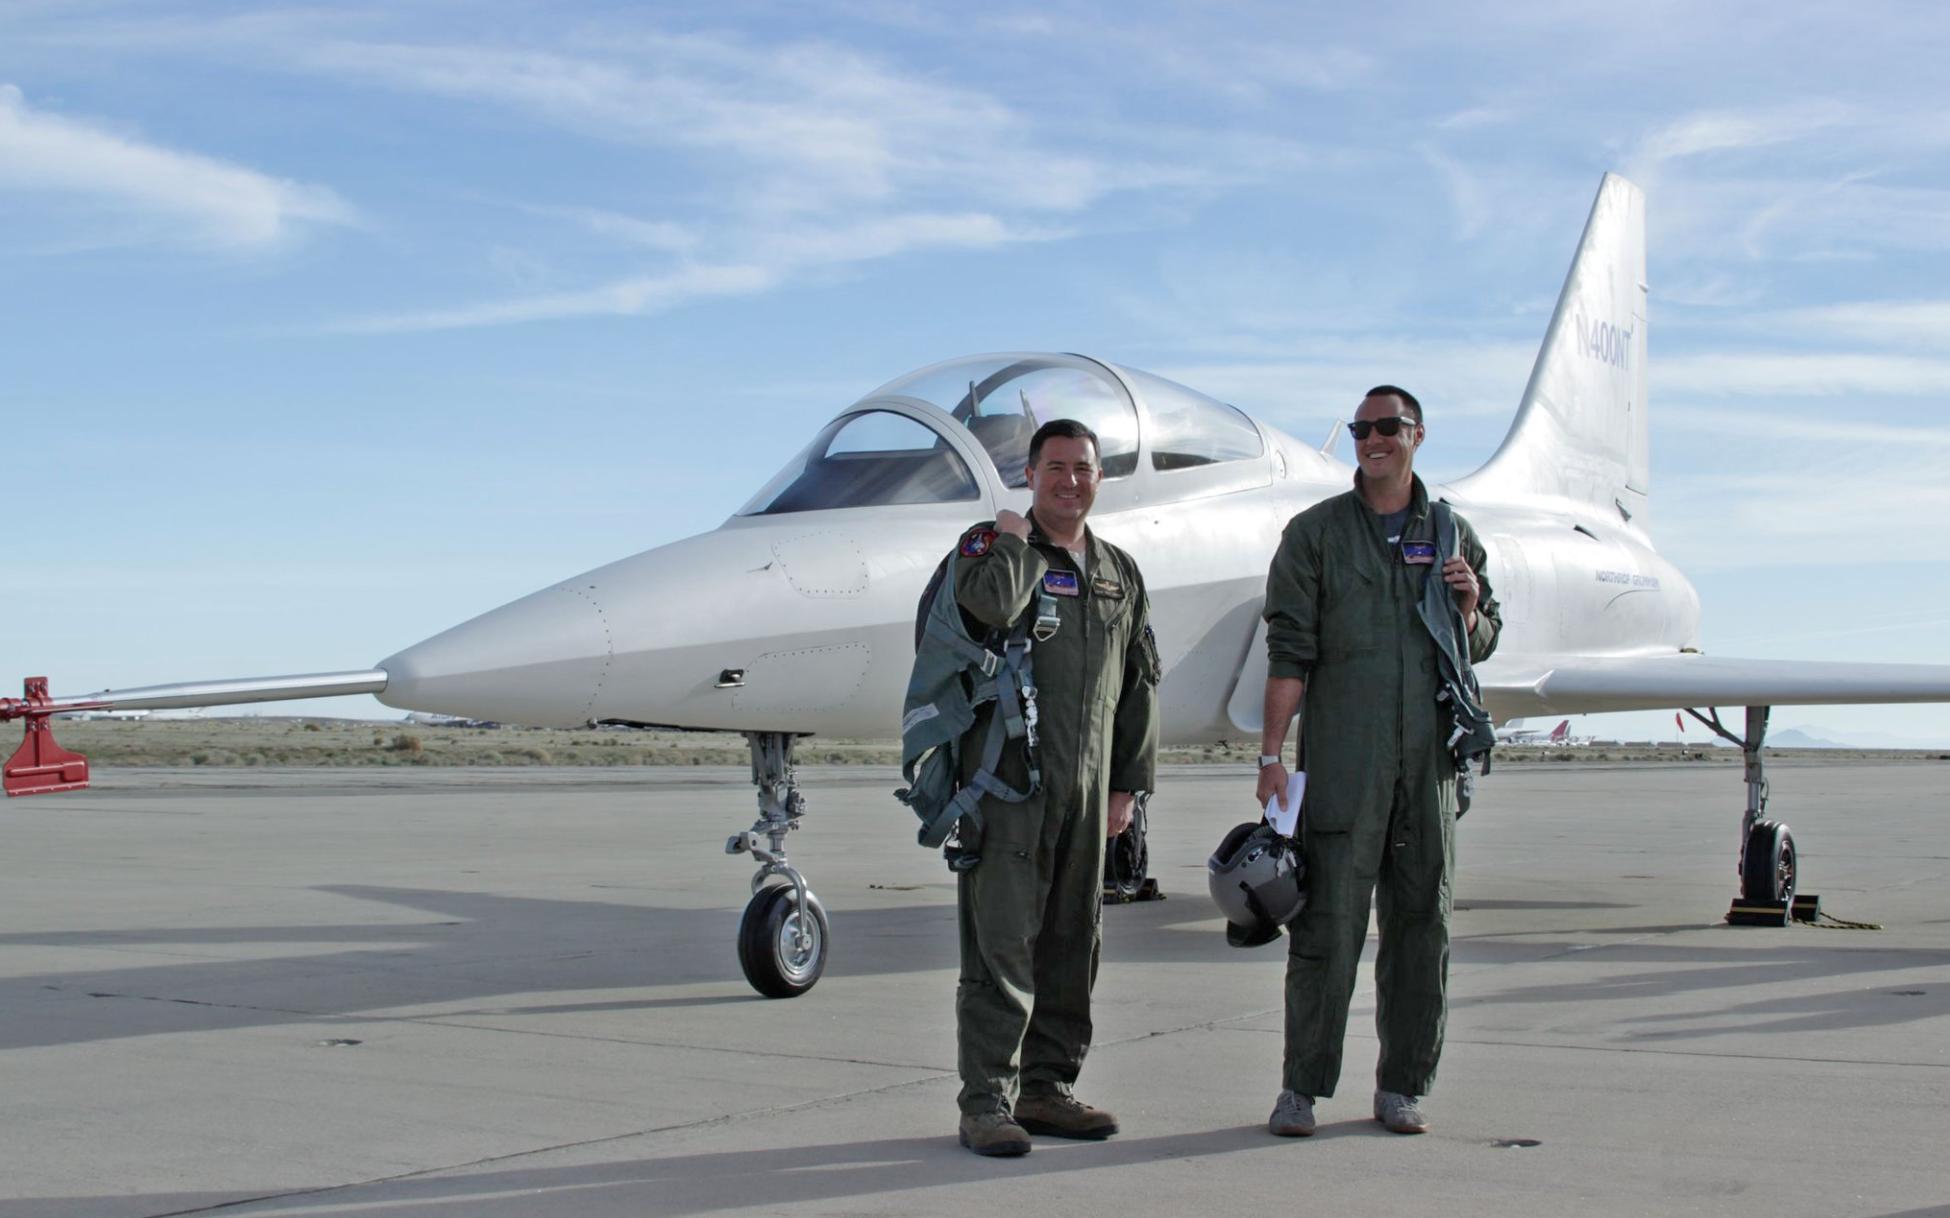 PROGRAMA T-X USAF BUSCA NUEVO AVION JET ENTRENADOR - Página 2 ?q=60&url=https%3A%2F%2Fs3.amazonaws.com%2Fthe-drive-staging%2Fmessage-editor%252F1506045720730-screenshot2017-09-21at6.02.03pm